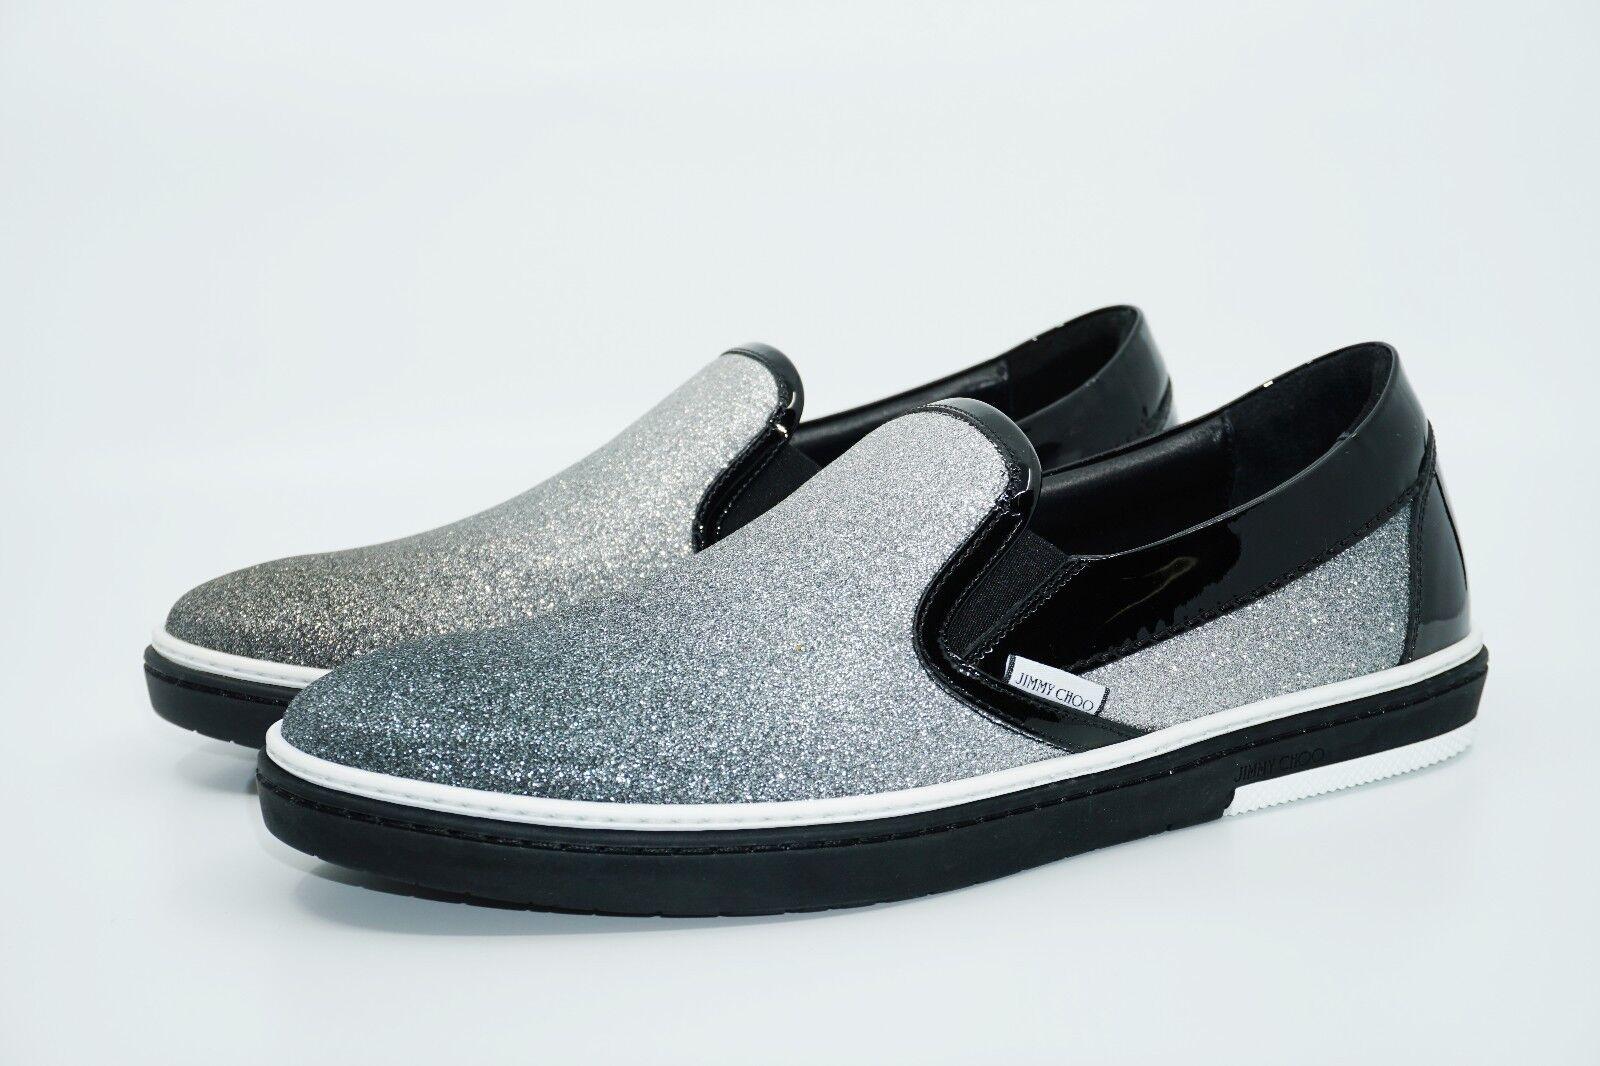 Jimmy Choo Men's Grove Glittered Leather Slip-On Sneaker,Silver/Black, MSRP $595